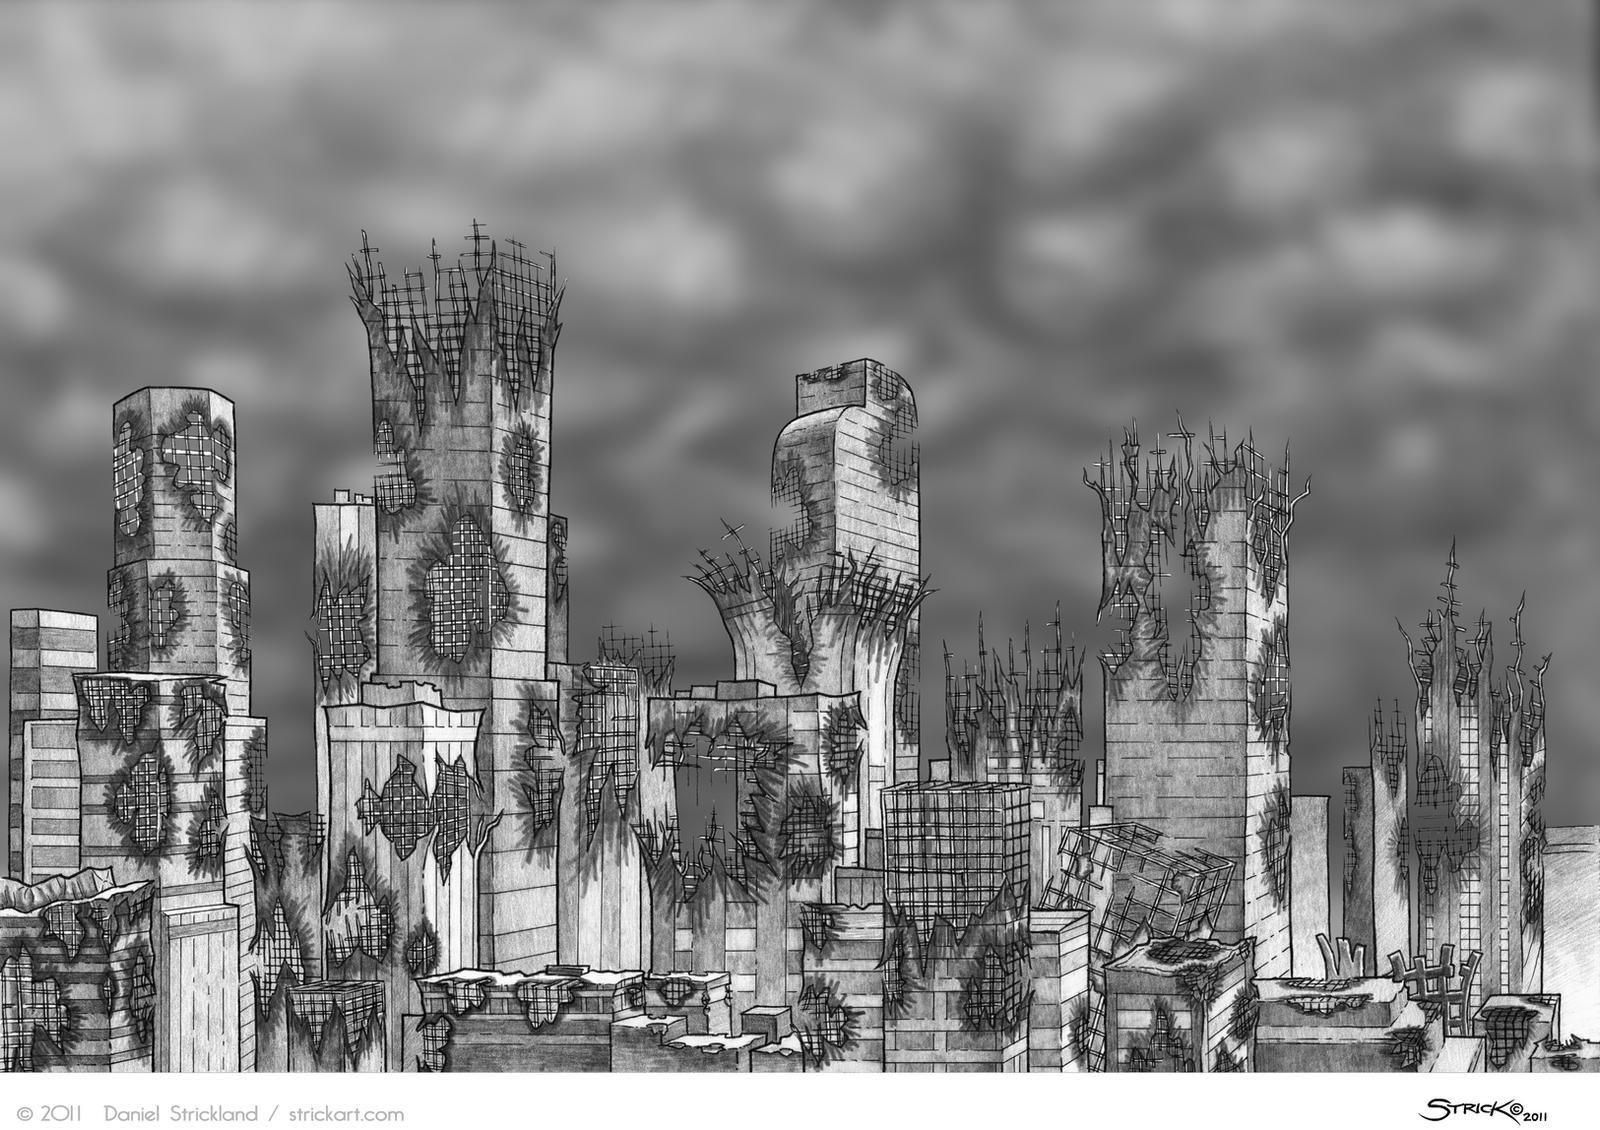 City Ruins shade by strickart